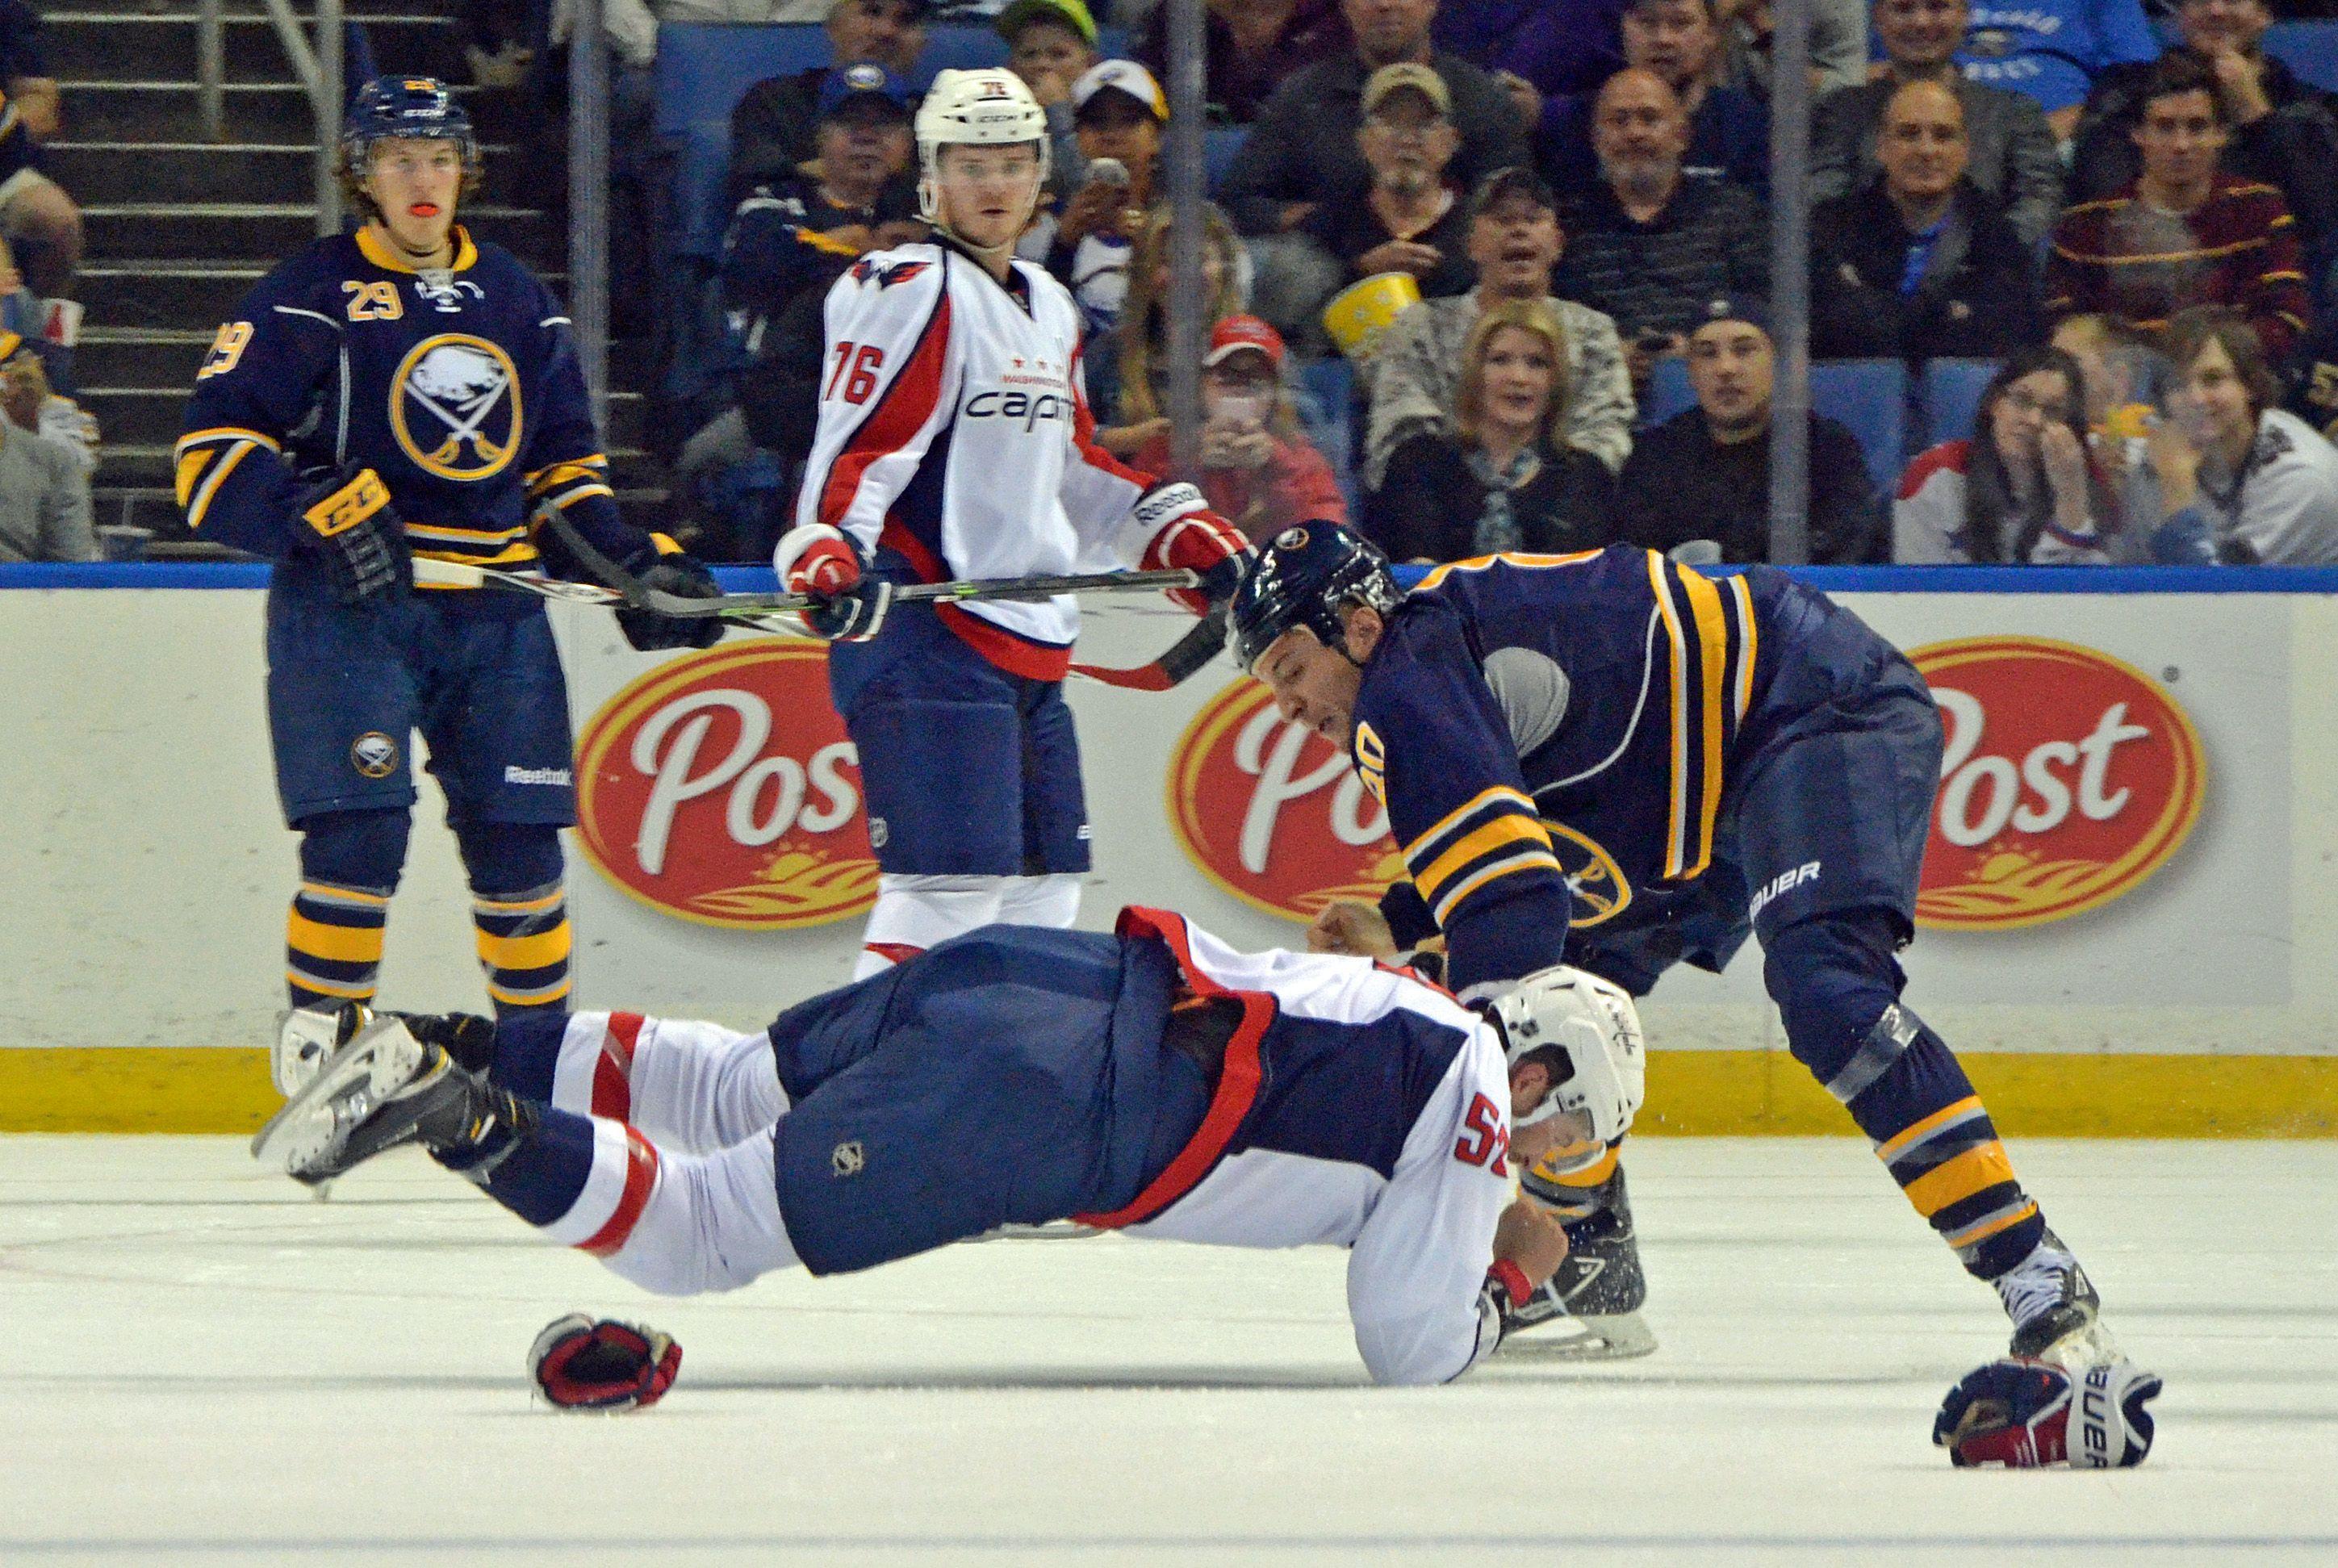 Photo: Sabres' Chris Stewart pummels Dane Byers